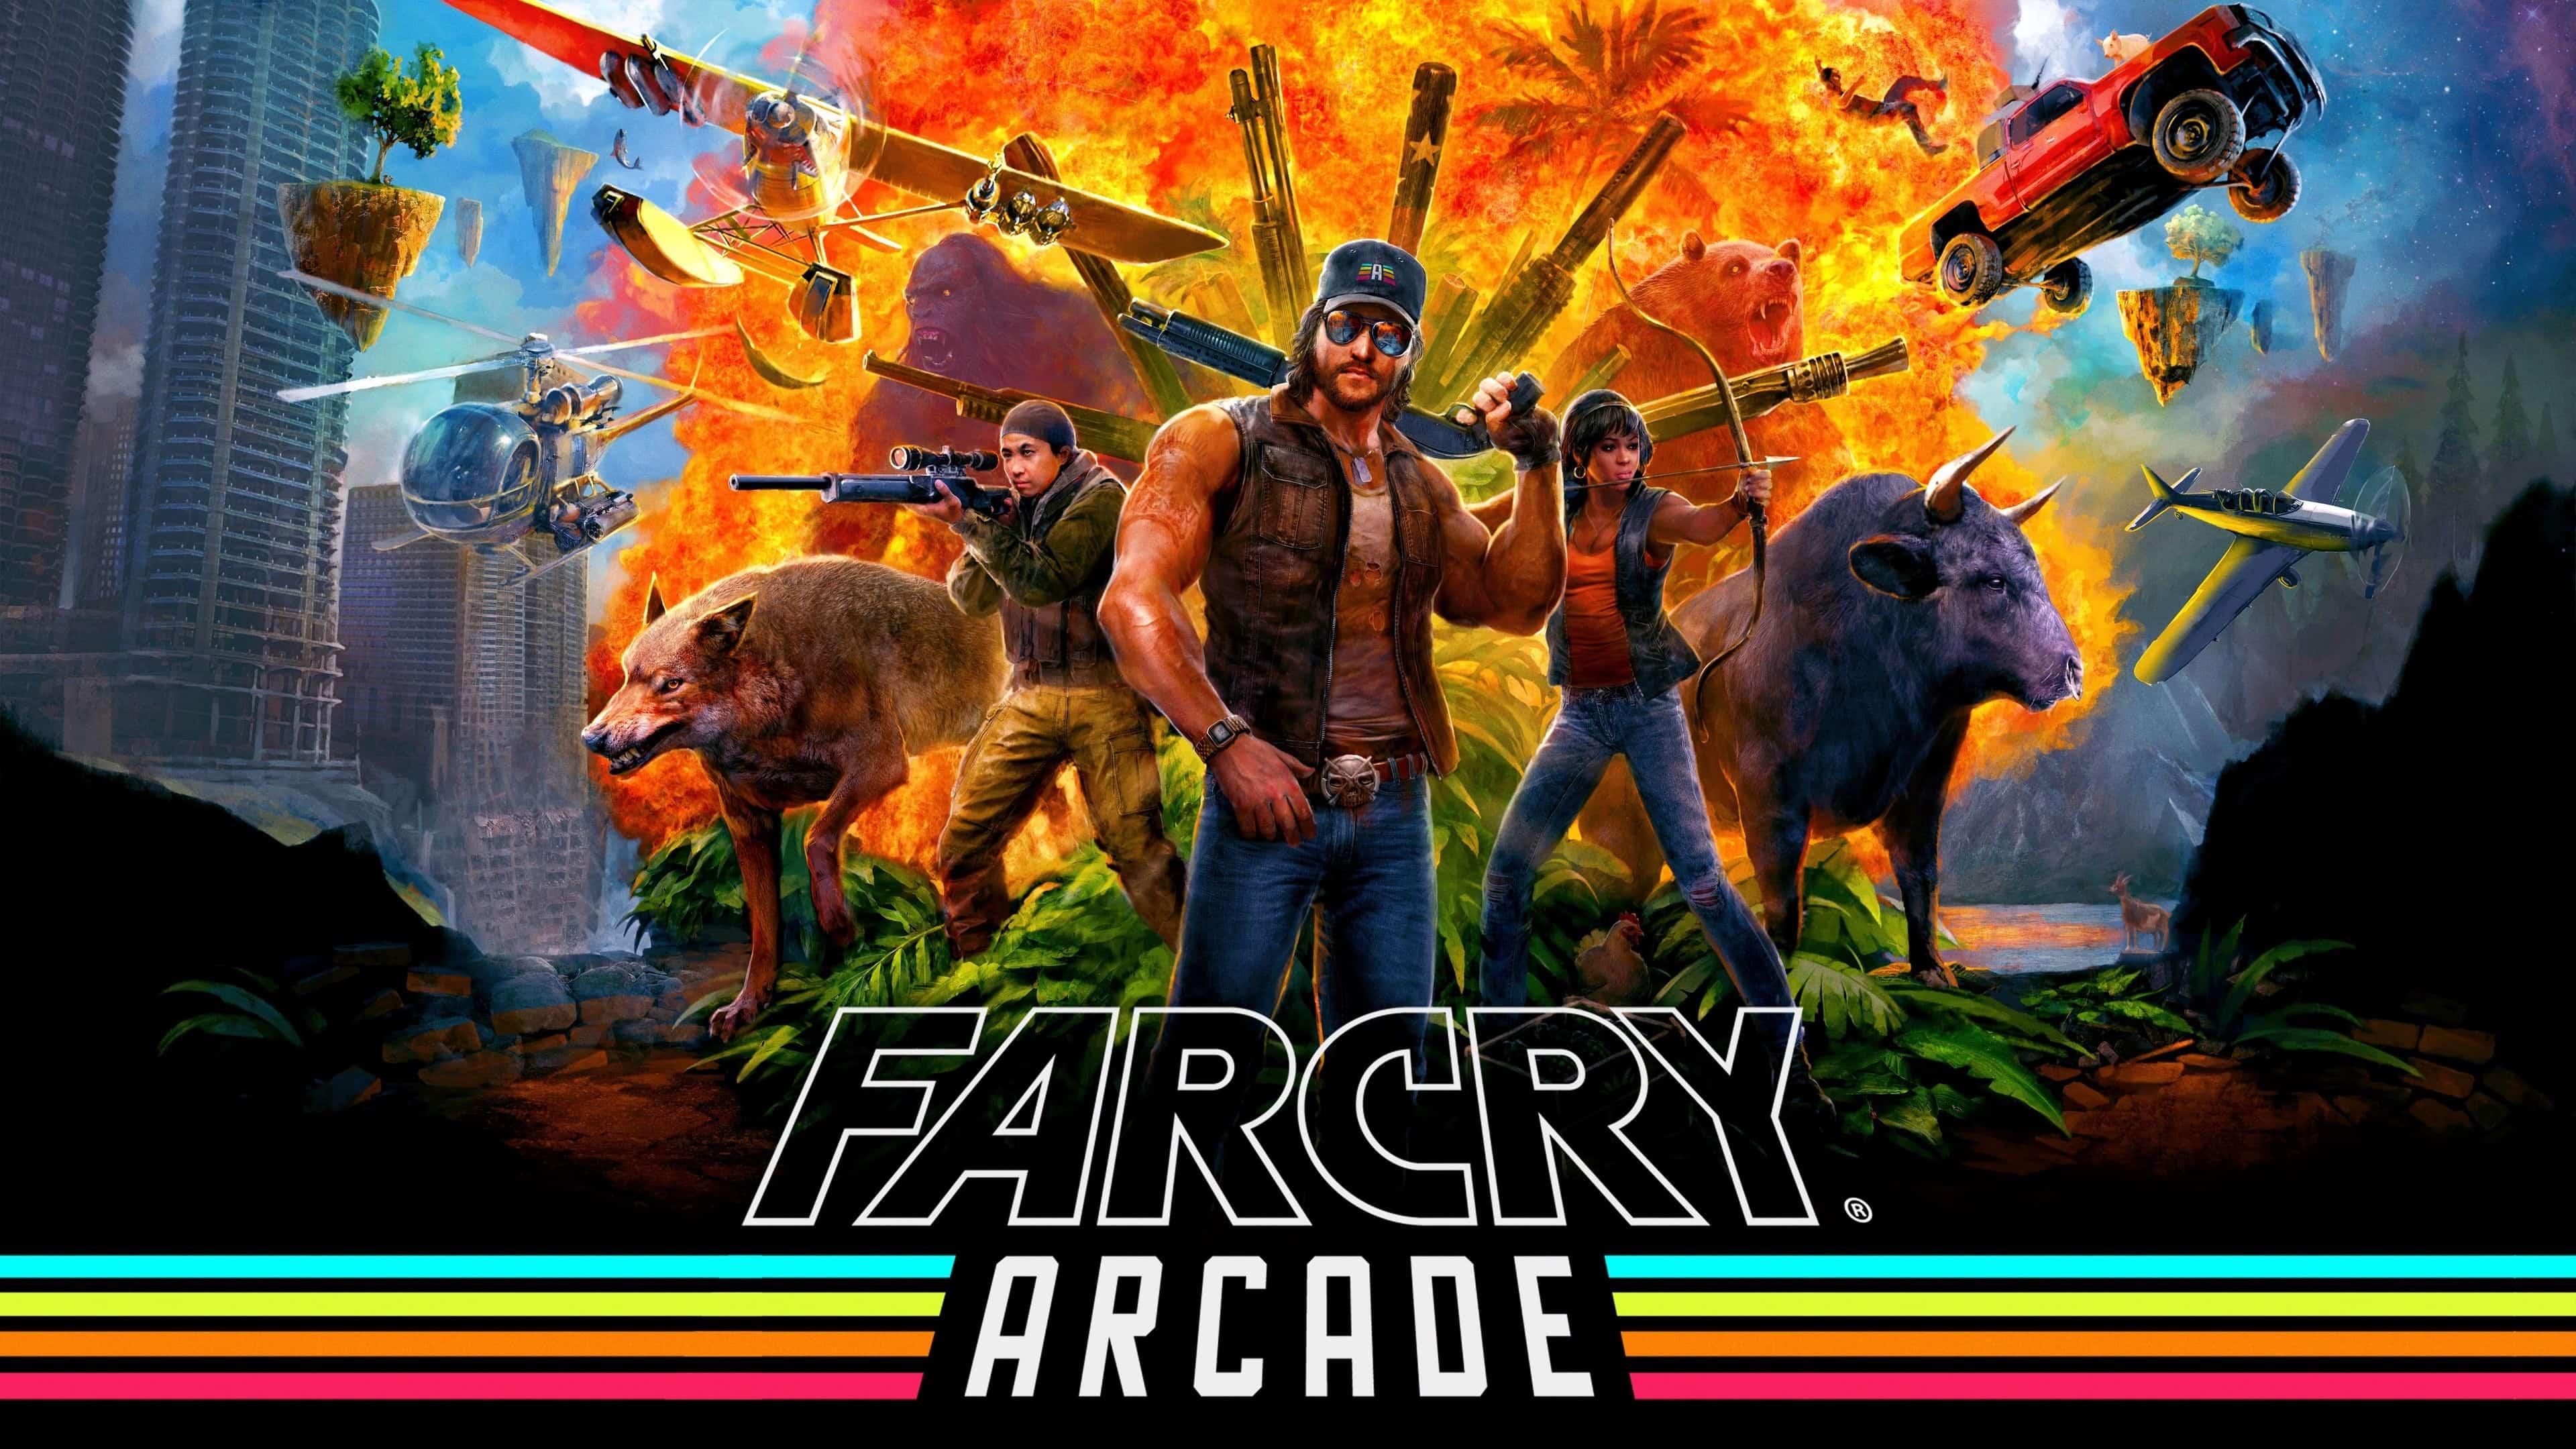 Cars Pc Wallpapers Hd Far Cry 5 Arcade Uhd 4k Wallpaper Pixelz